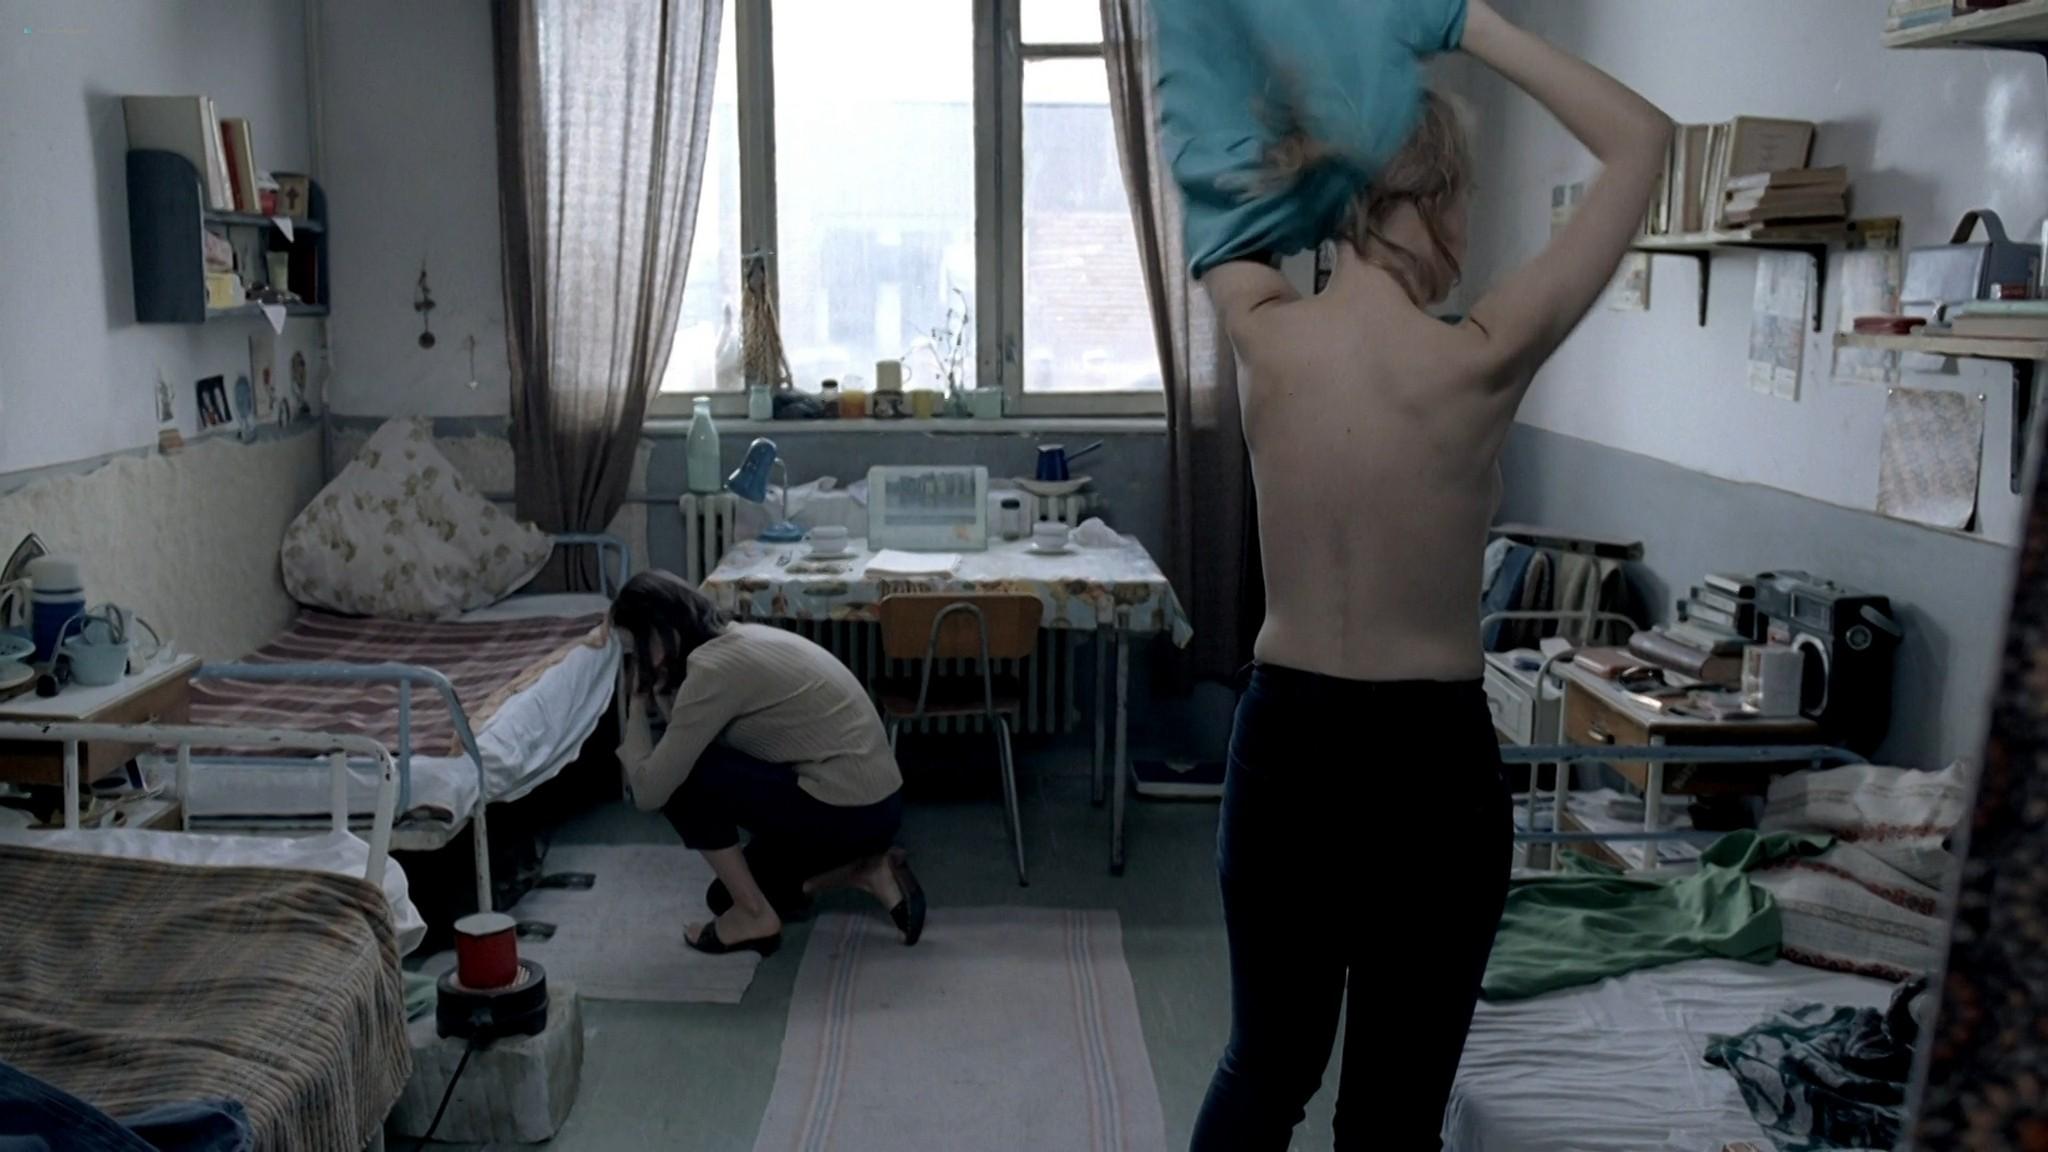 Laura Vasiliu nude bush Anamaria Marinca nude too 4 Months 3 Weeks and 2 Days RO 2007 1080p BluRay 004